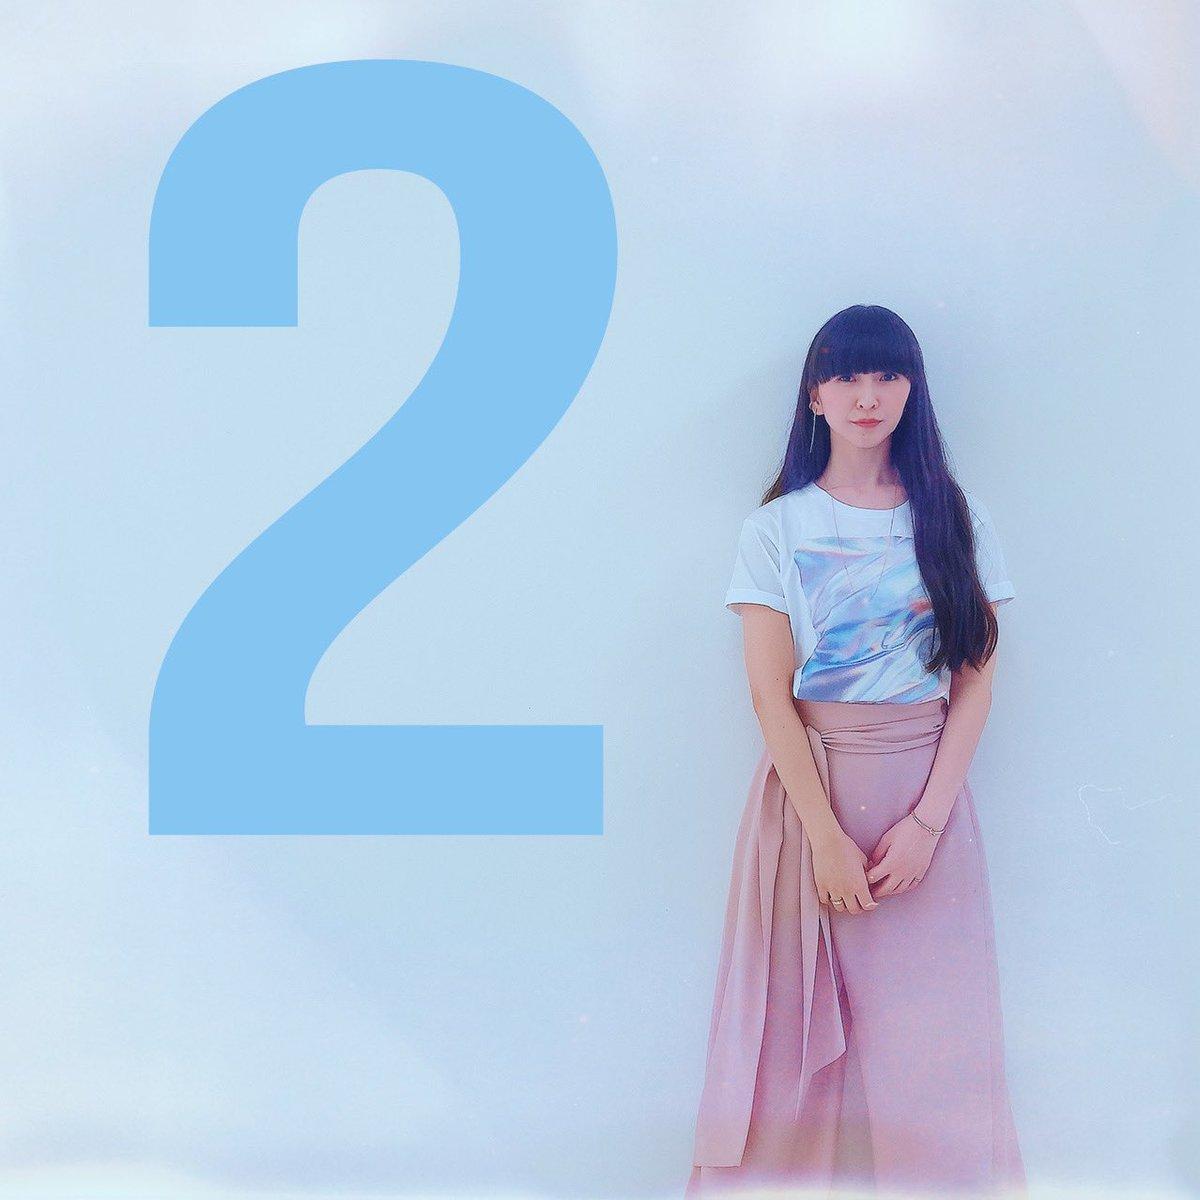 "「Perfume 8th Tour 2020 ""P Cubed"" in Dome」初日まであと2日です✨みなさんに会えるまでもう少し…!! #prfm #PCubed"